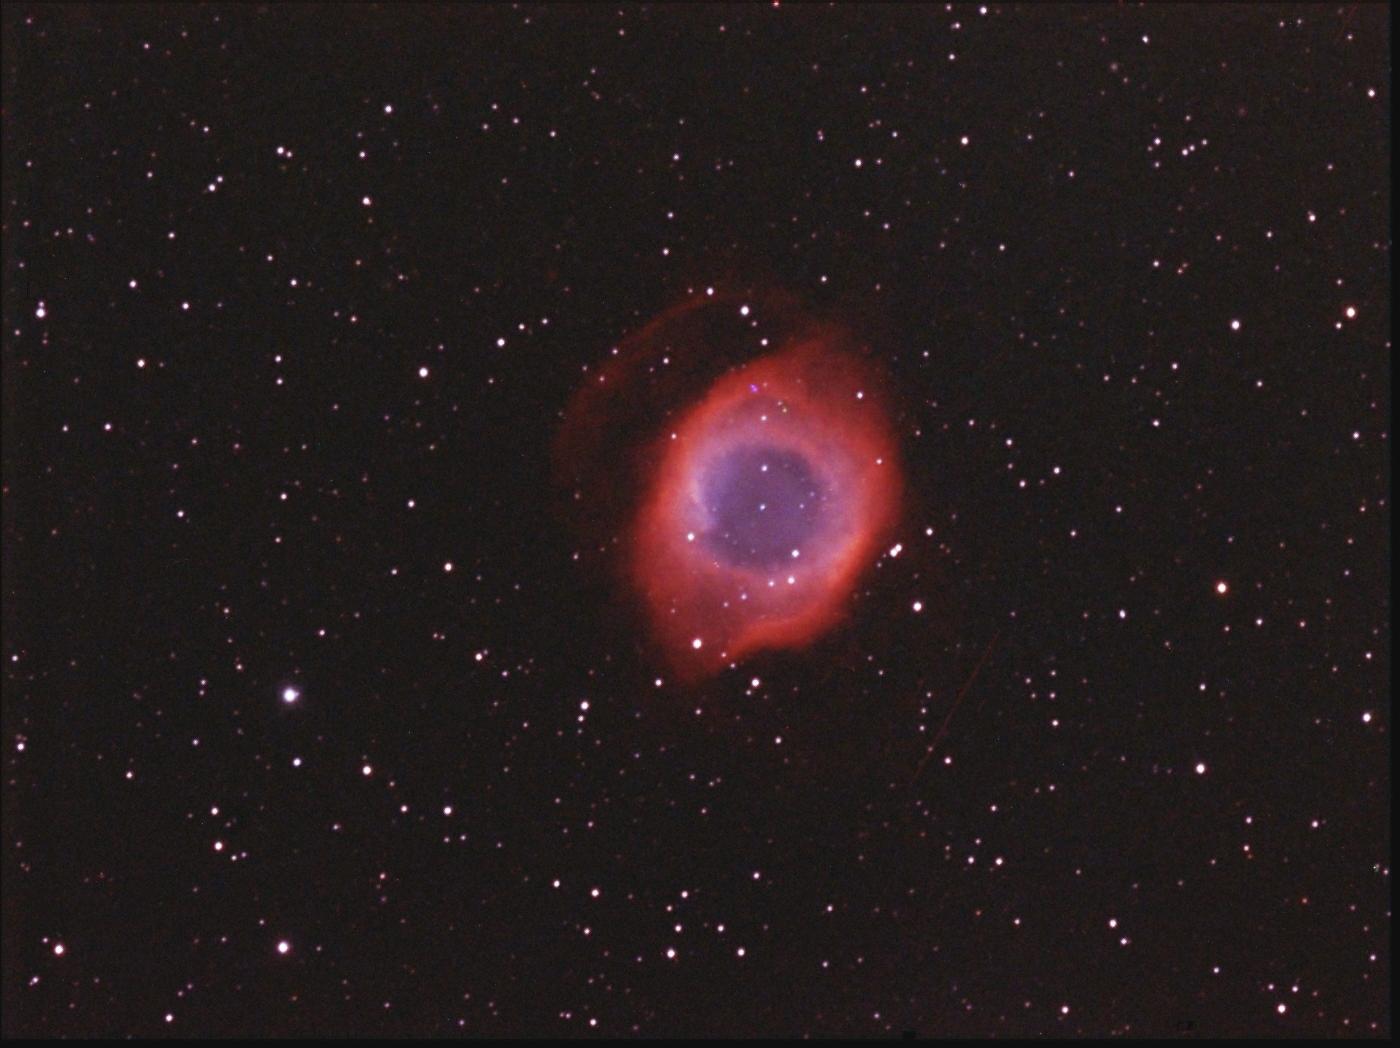 helix nebula constellation aquarius-#21